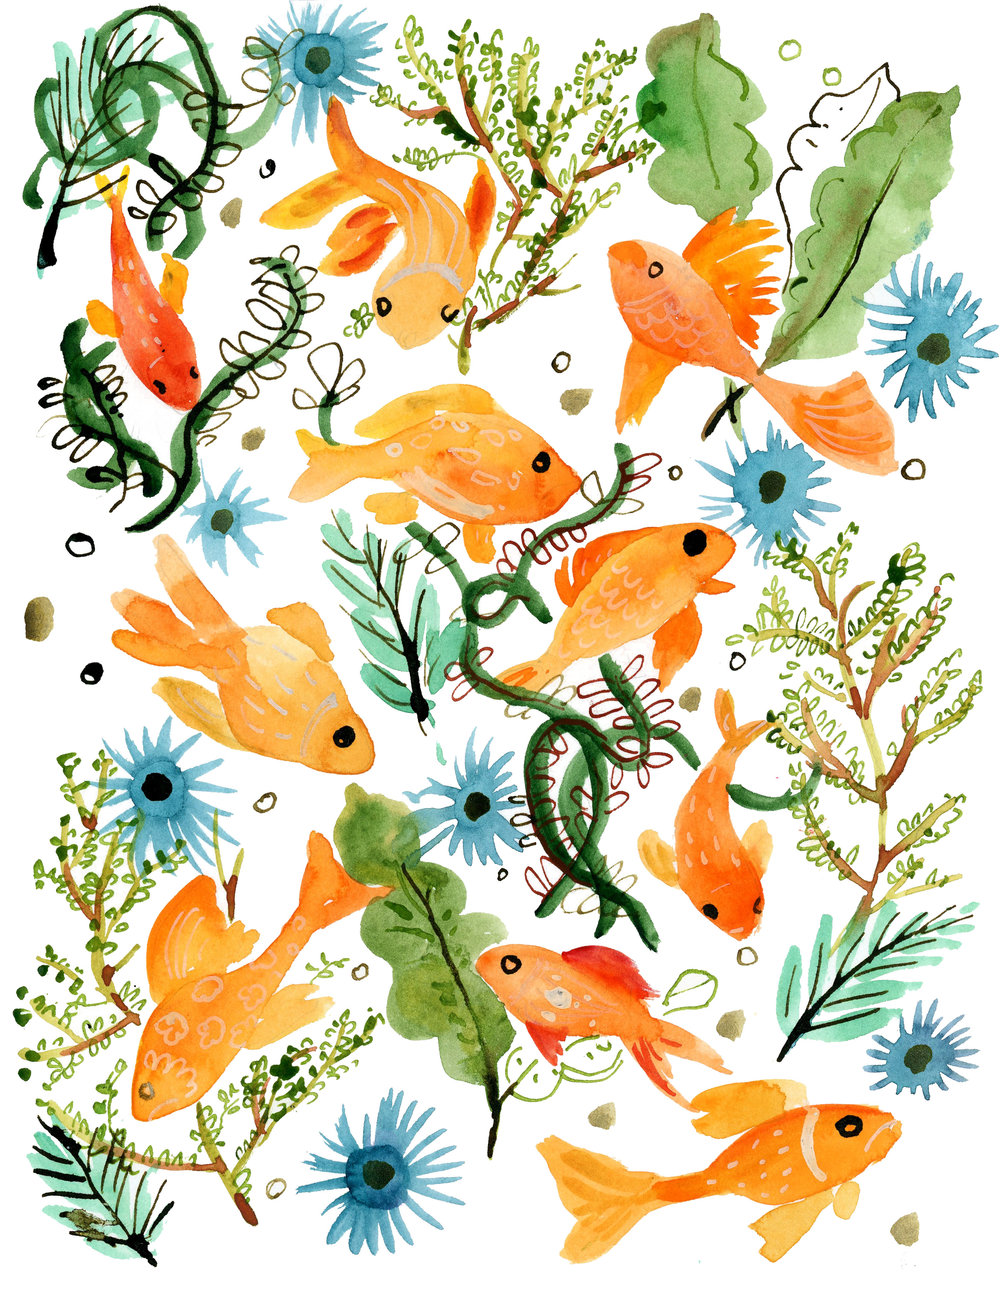 goldfishandseaweed